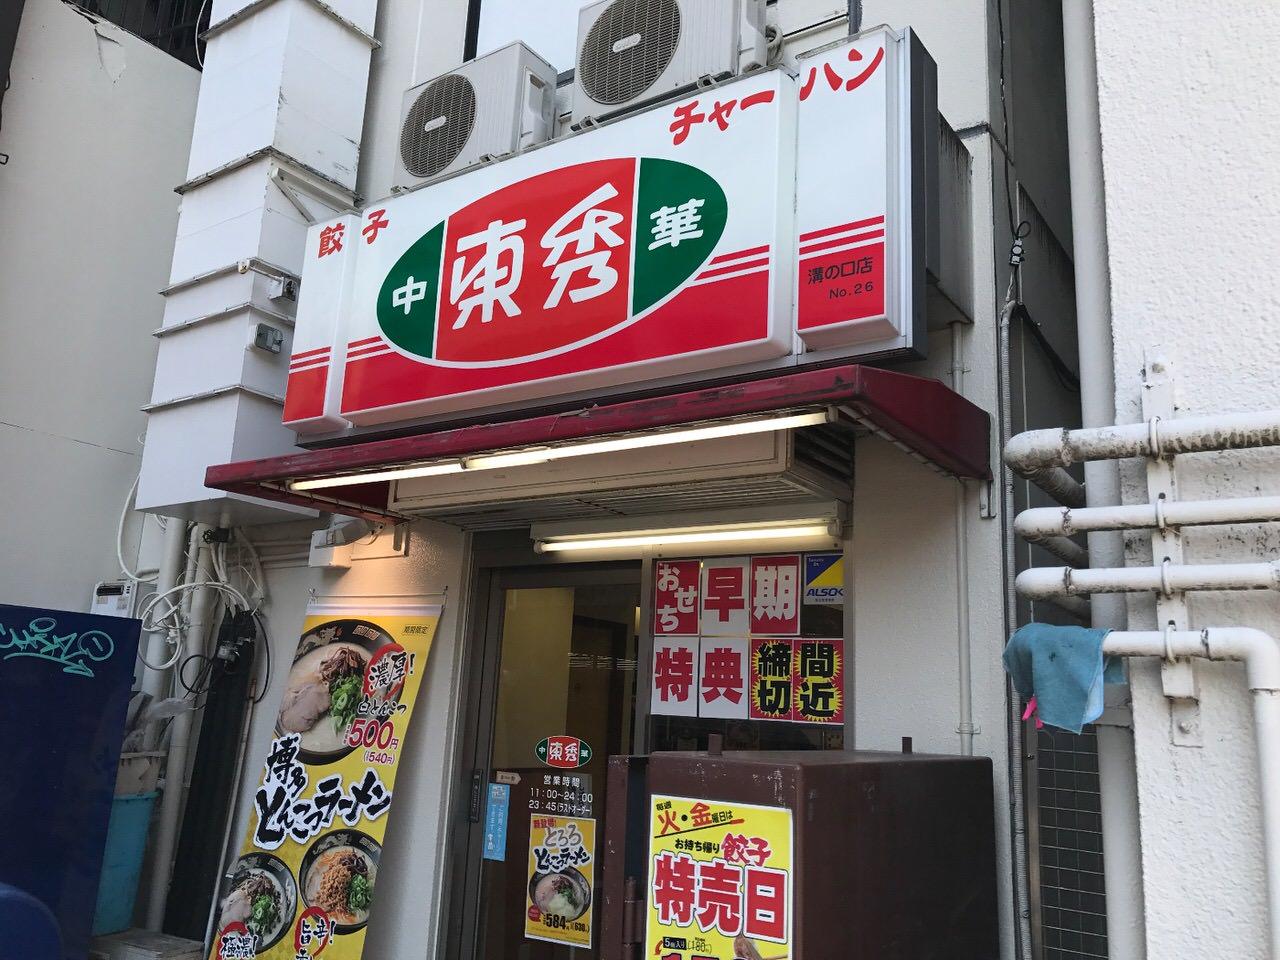 Toshu 2817